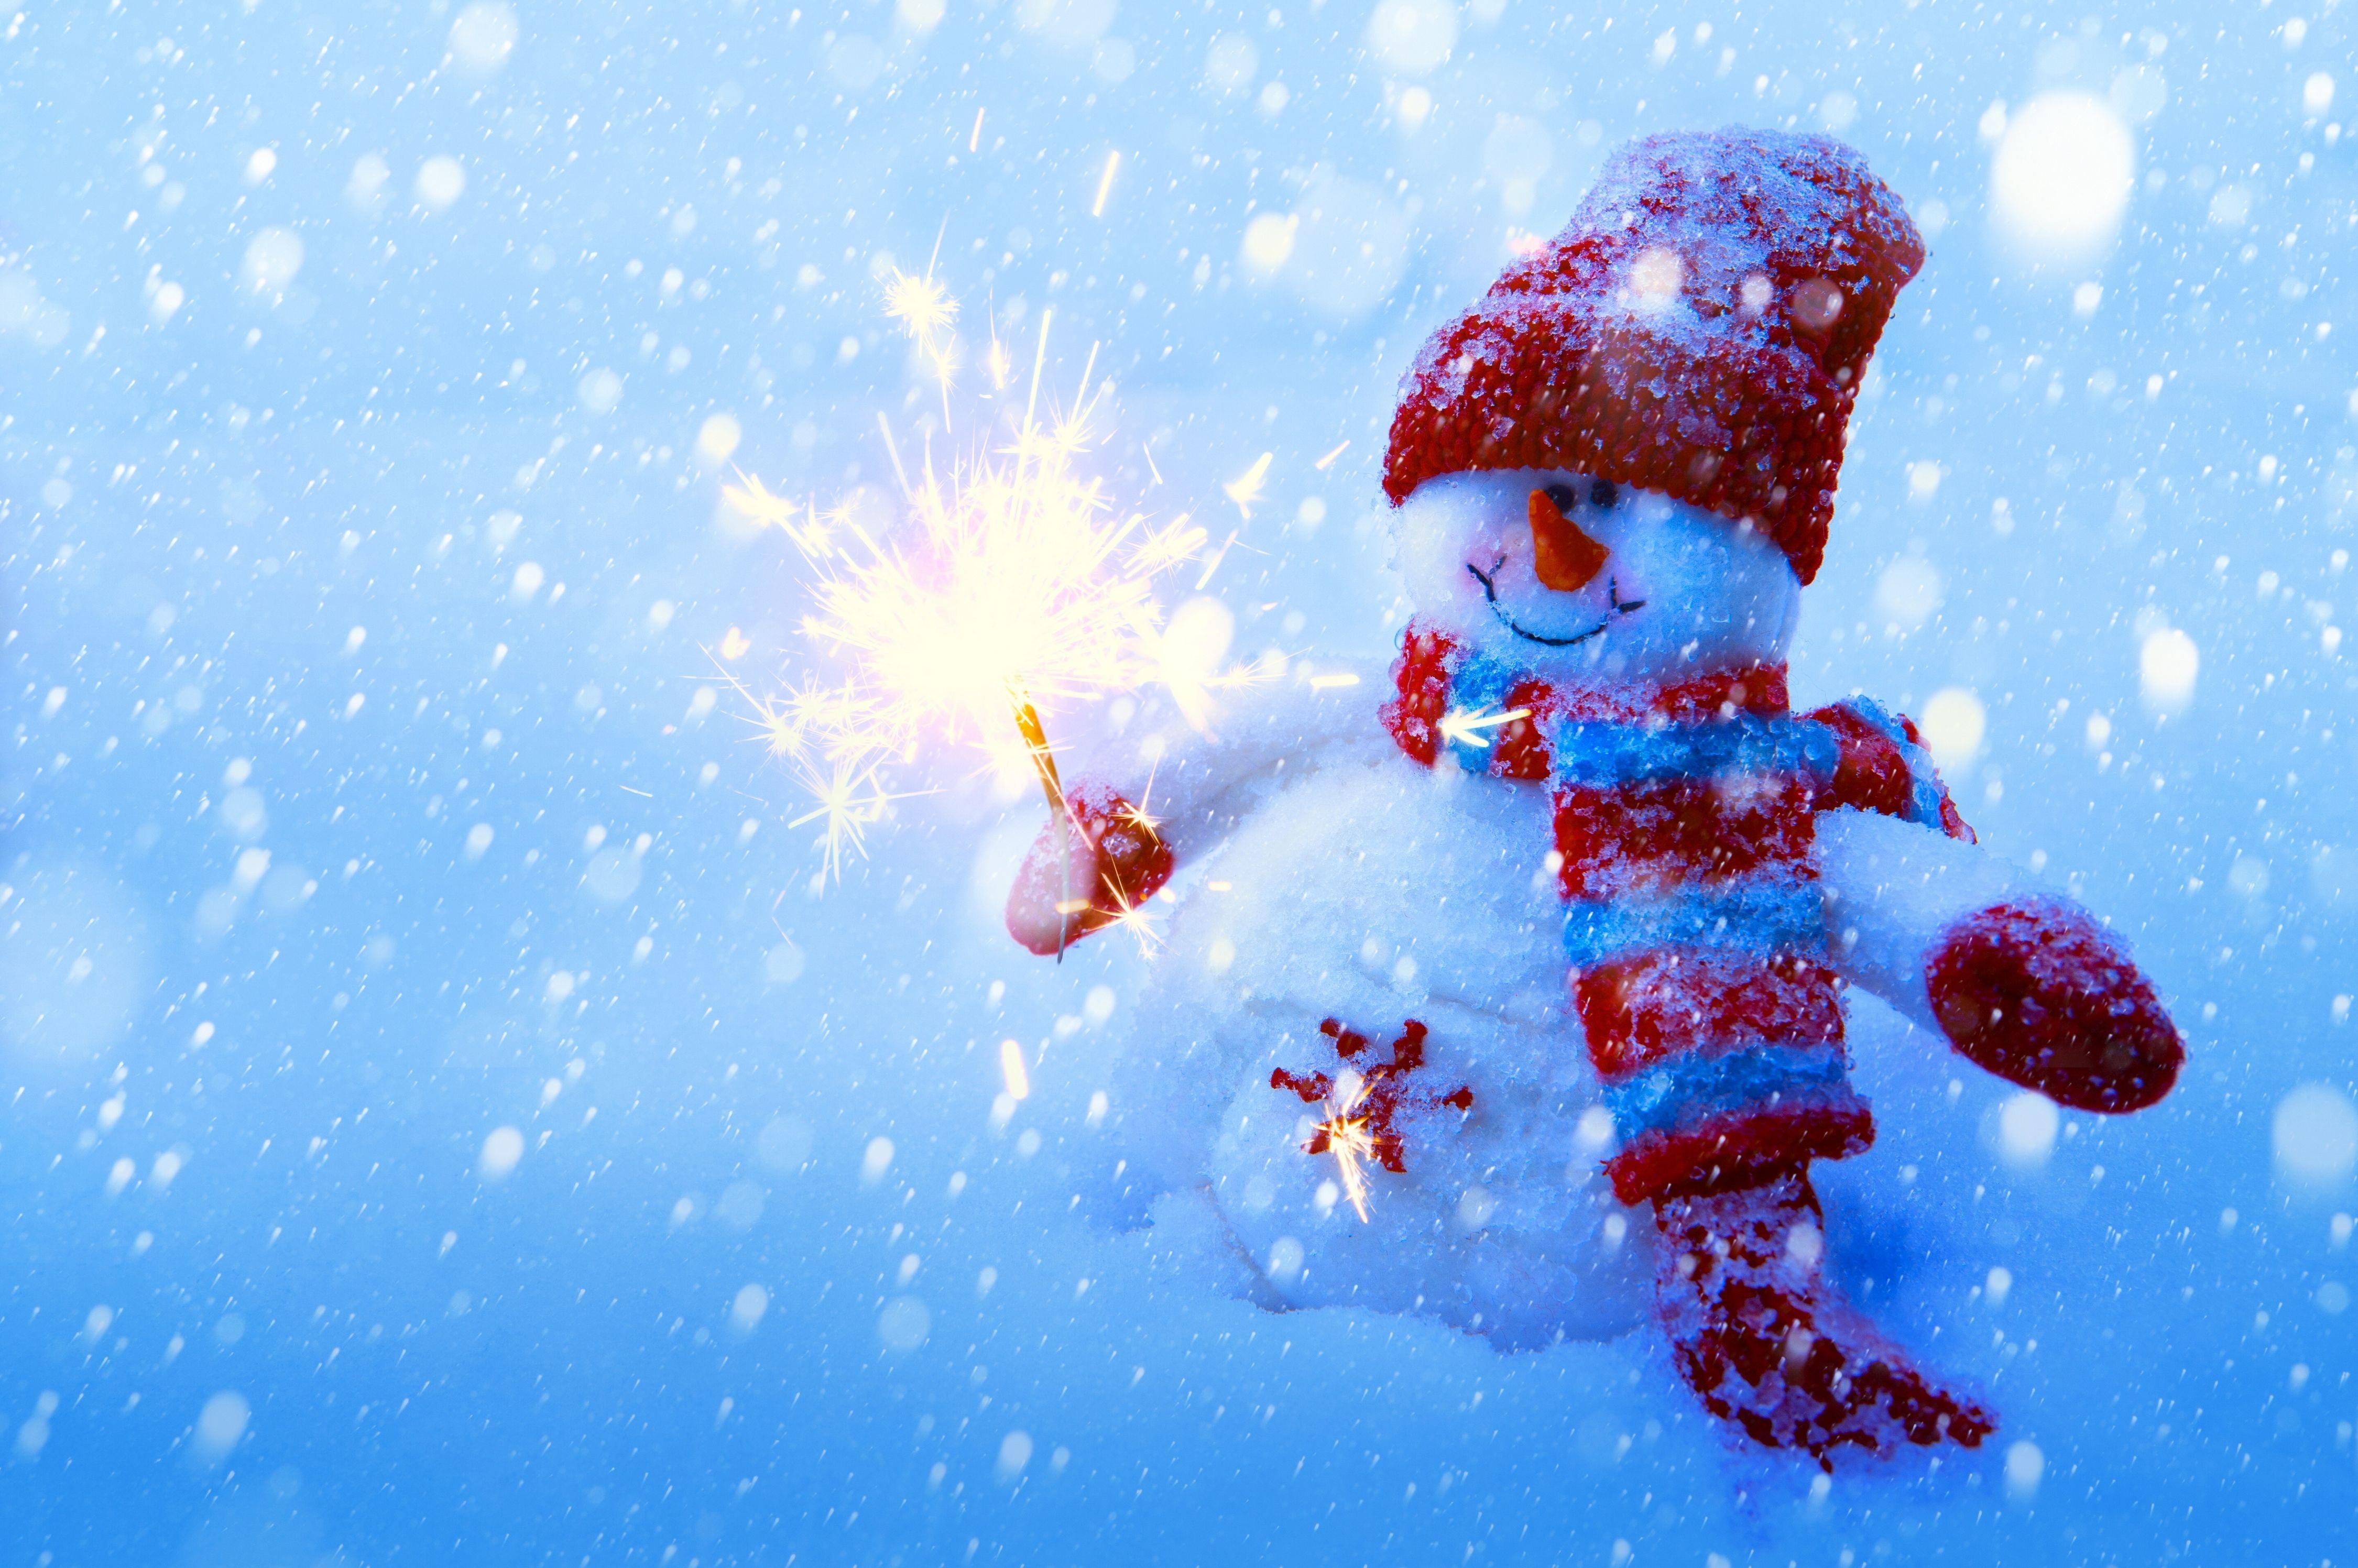 снеговик рождество улыбка снег бесплатно